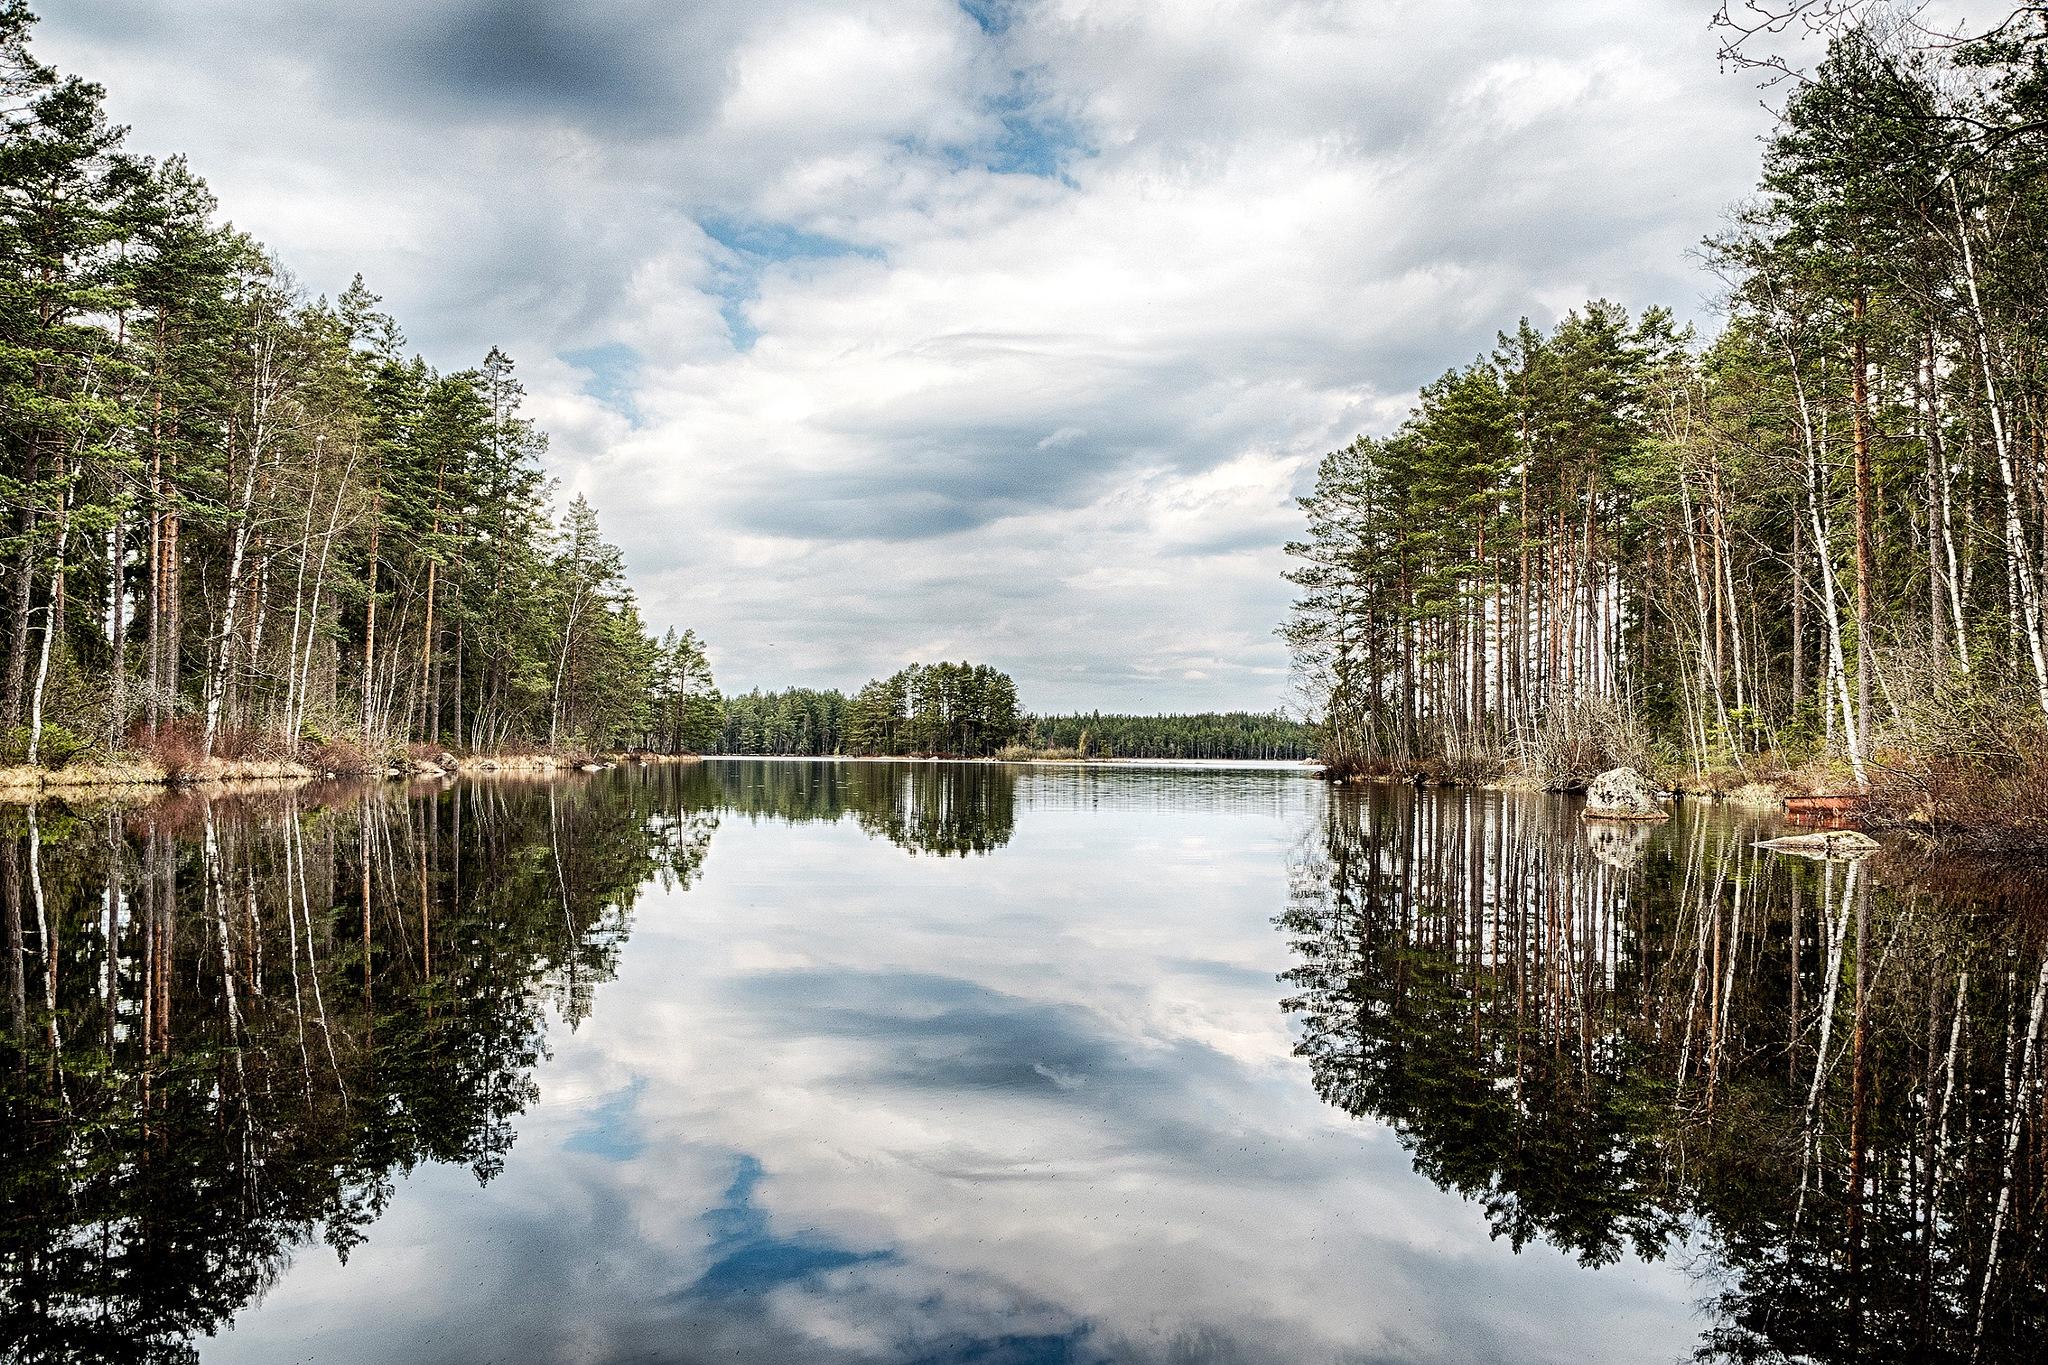 Hyllsjön / Shelflake by Sjunne